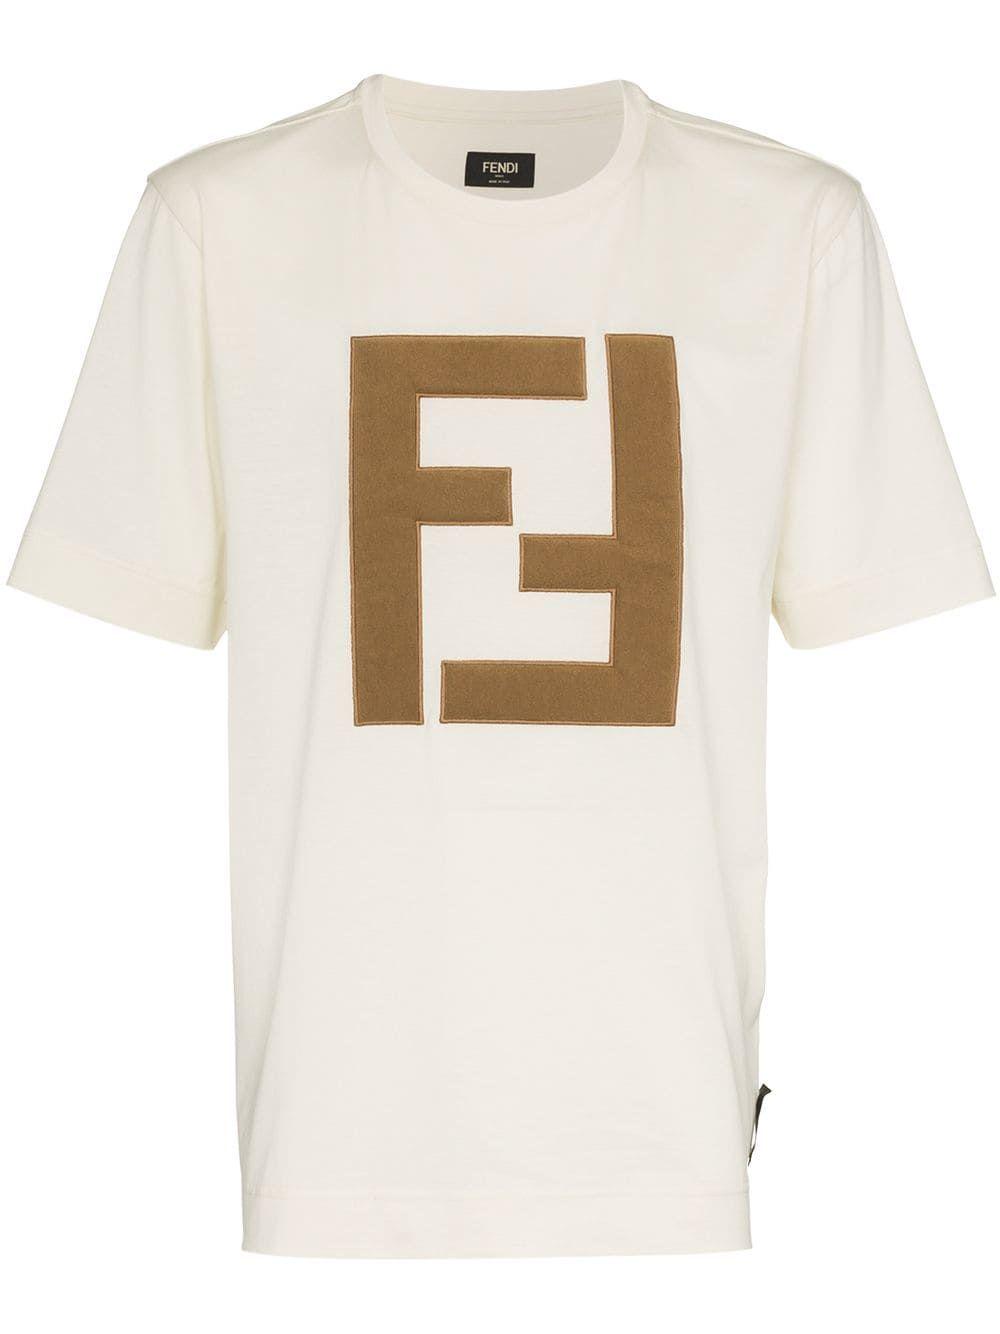 162b62bc0 FENDI FENDI LOGO EMBELLISHED COTTON T-SHIRT - NEUTRALS.  fendi  cloth